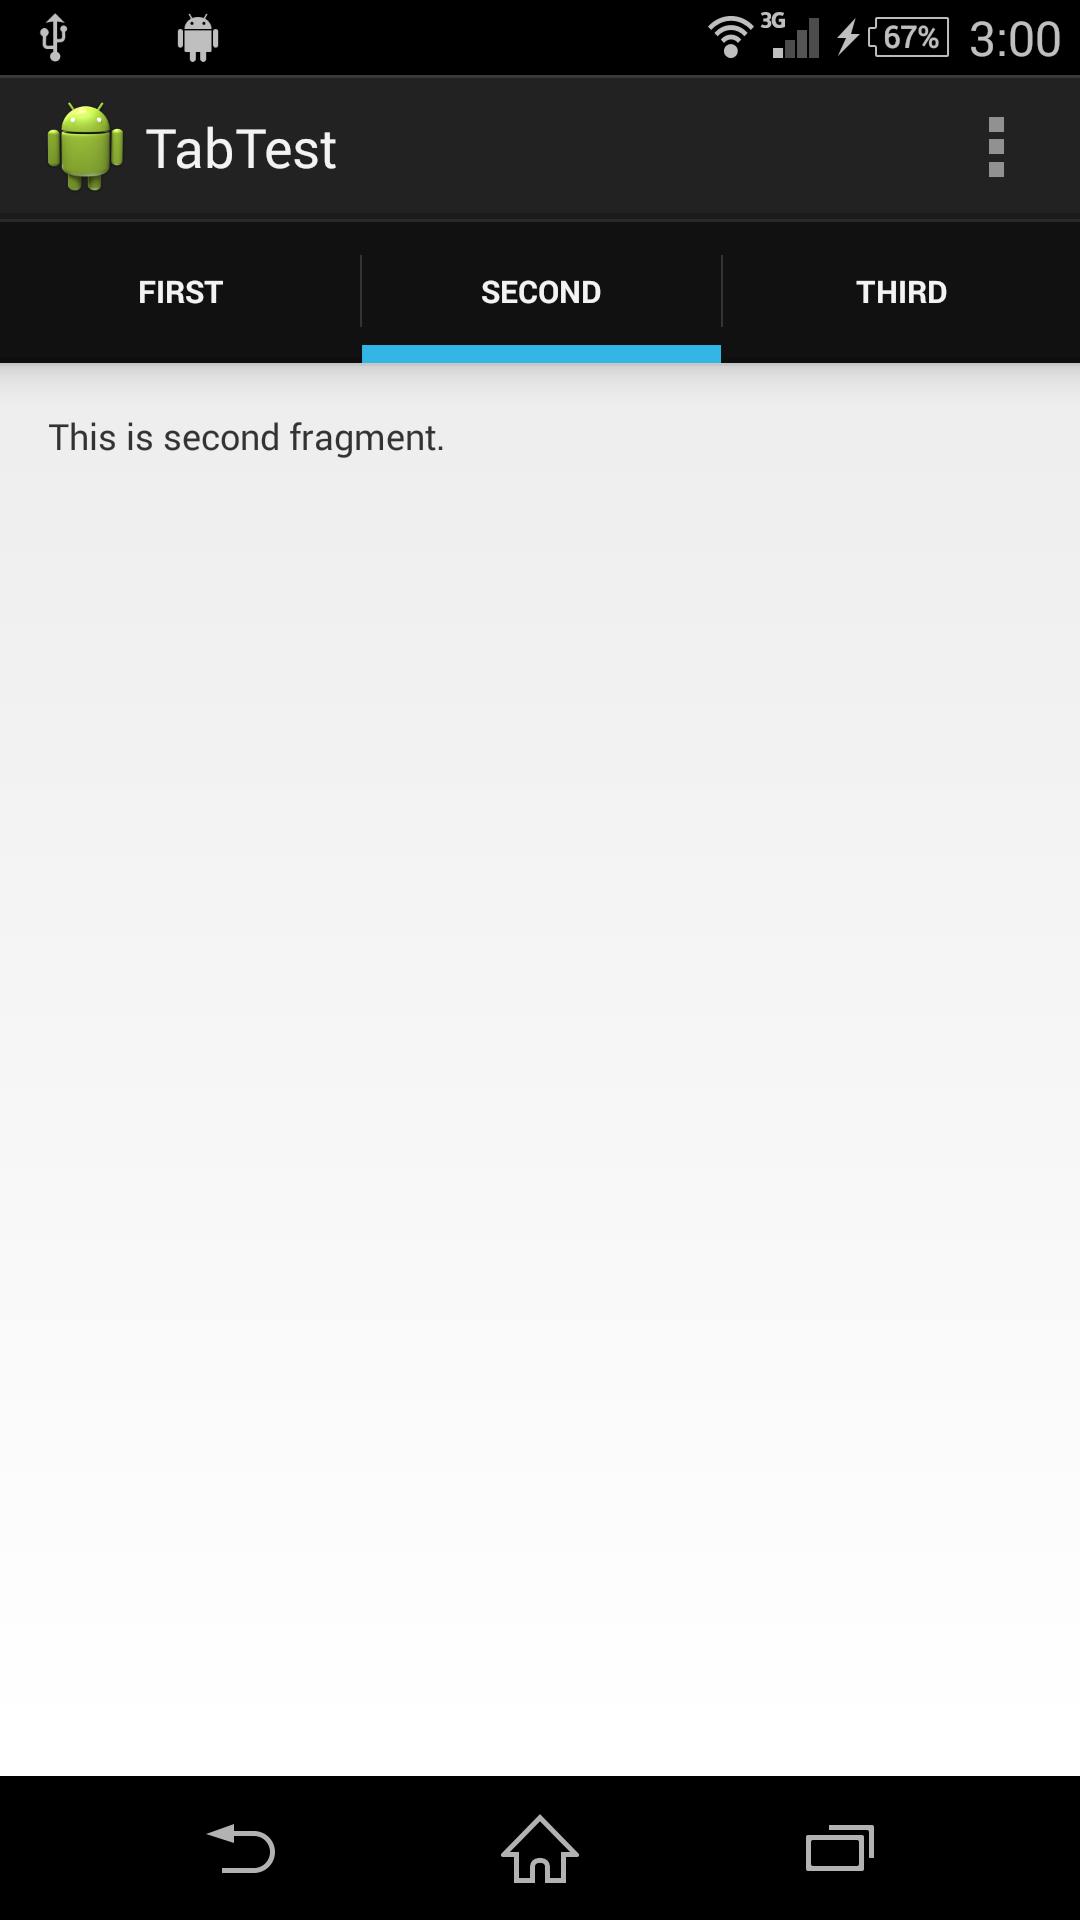 Screenshot_2014-07-13-03-00-43.png